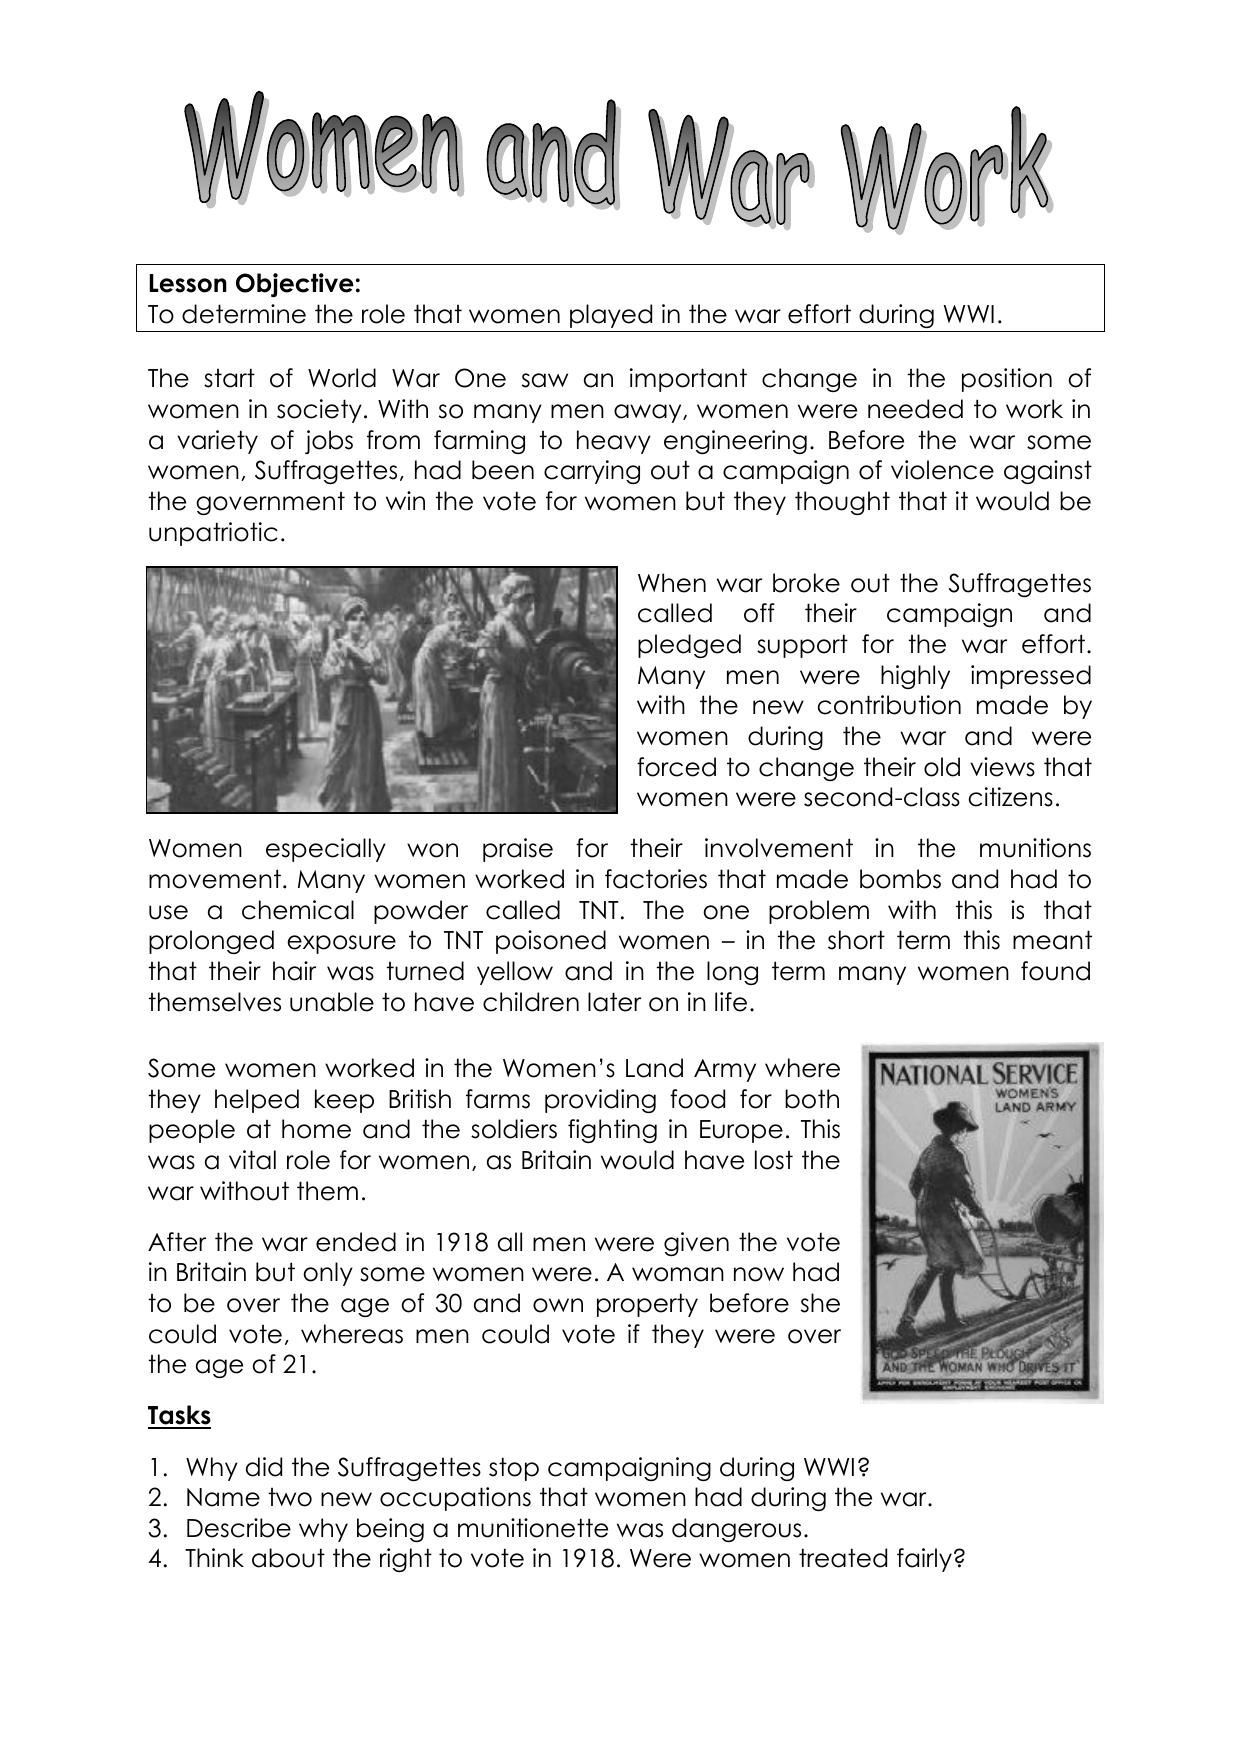 Crash Course Us History Worksheets Pdf   Crash course us history [ 1754 x 1241 Pixel ]